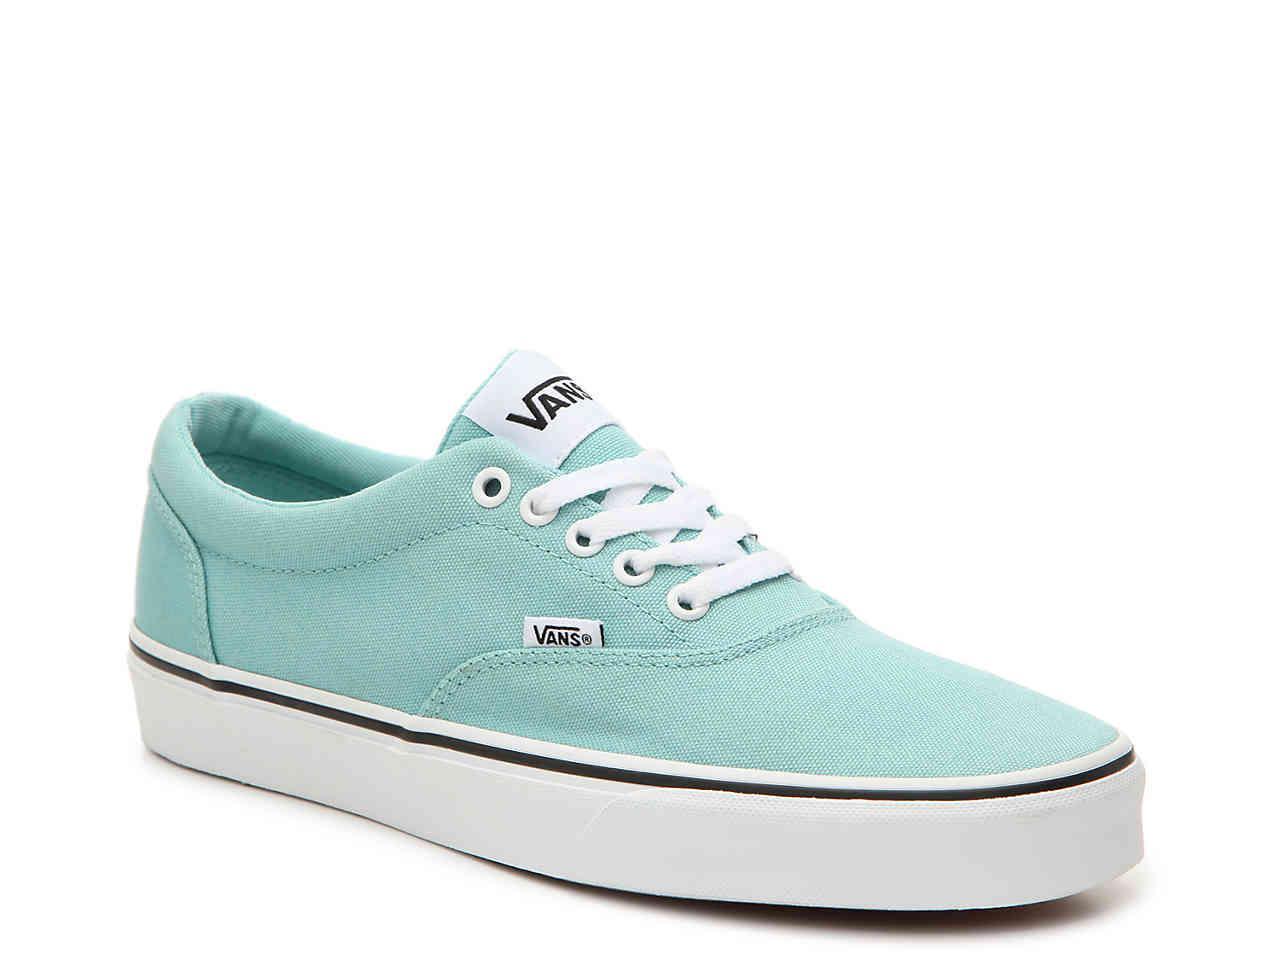 341b195860ec2a Vans - Blue Doheny Sneaker for Men - Lyst. View fullscreen